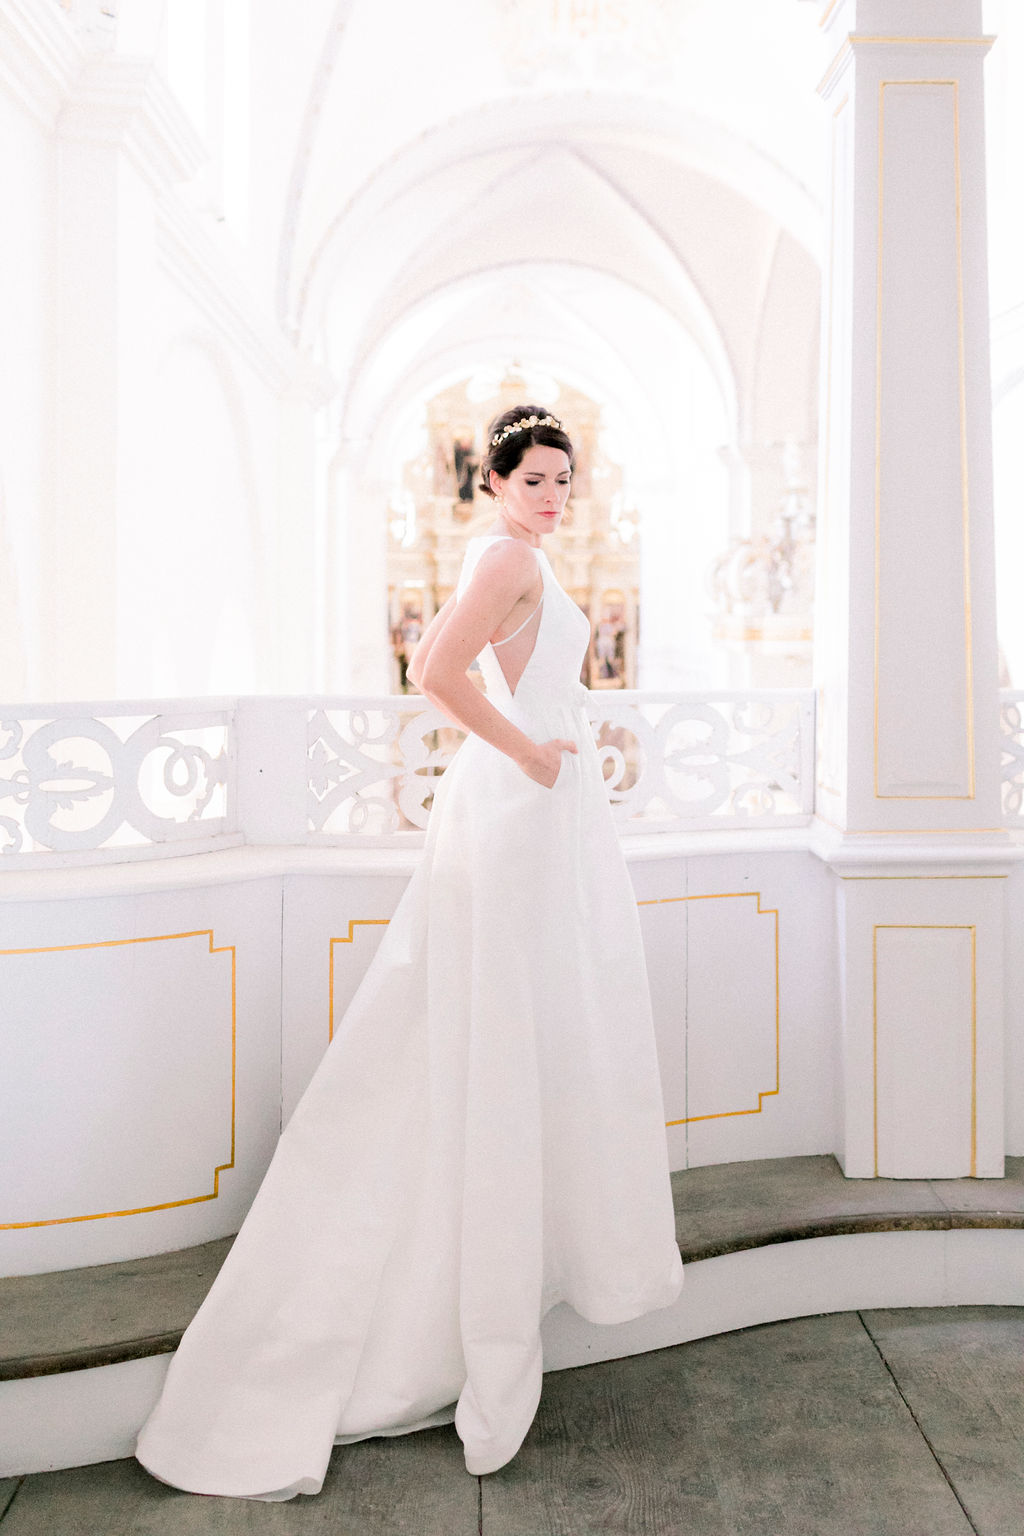 bride, white wedding dress, minimalist wedding, religious wedding